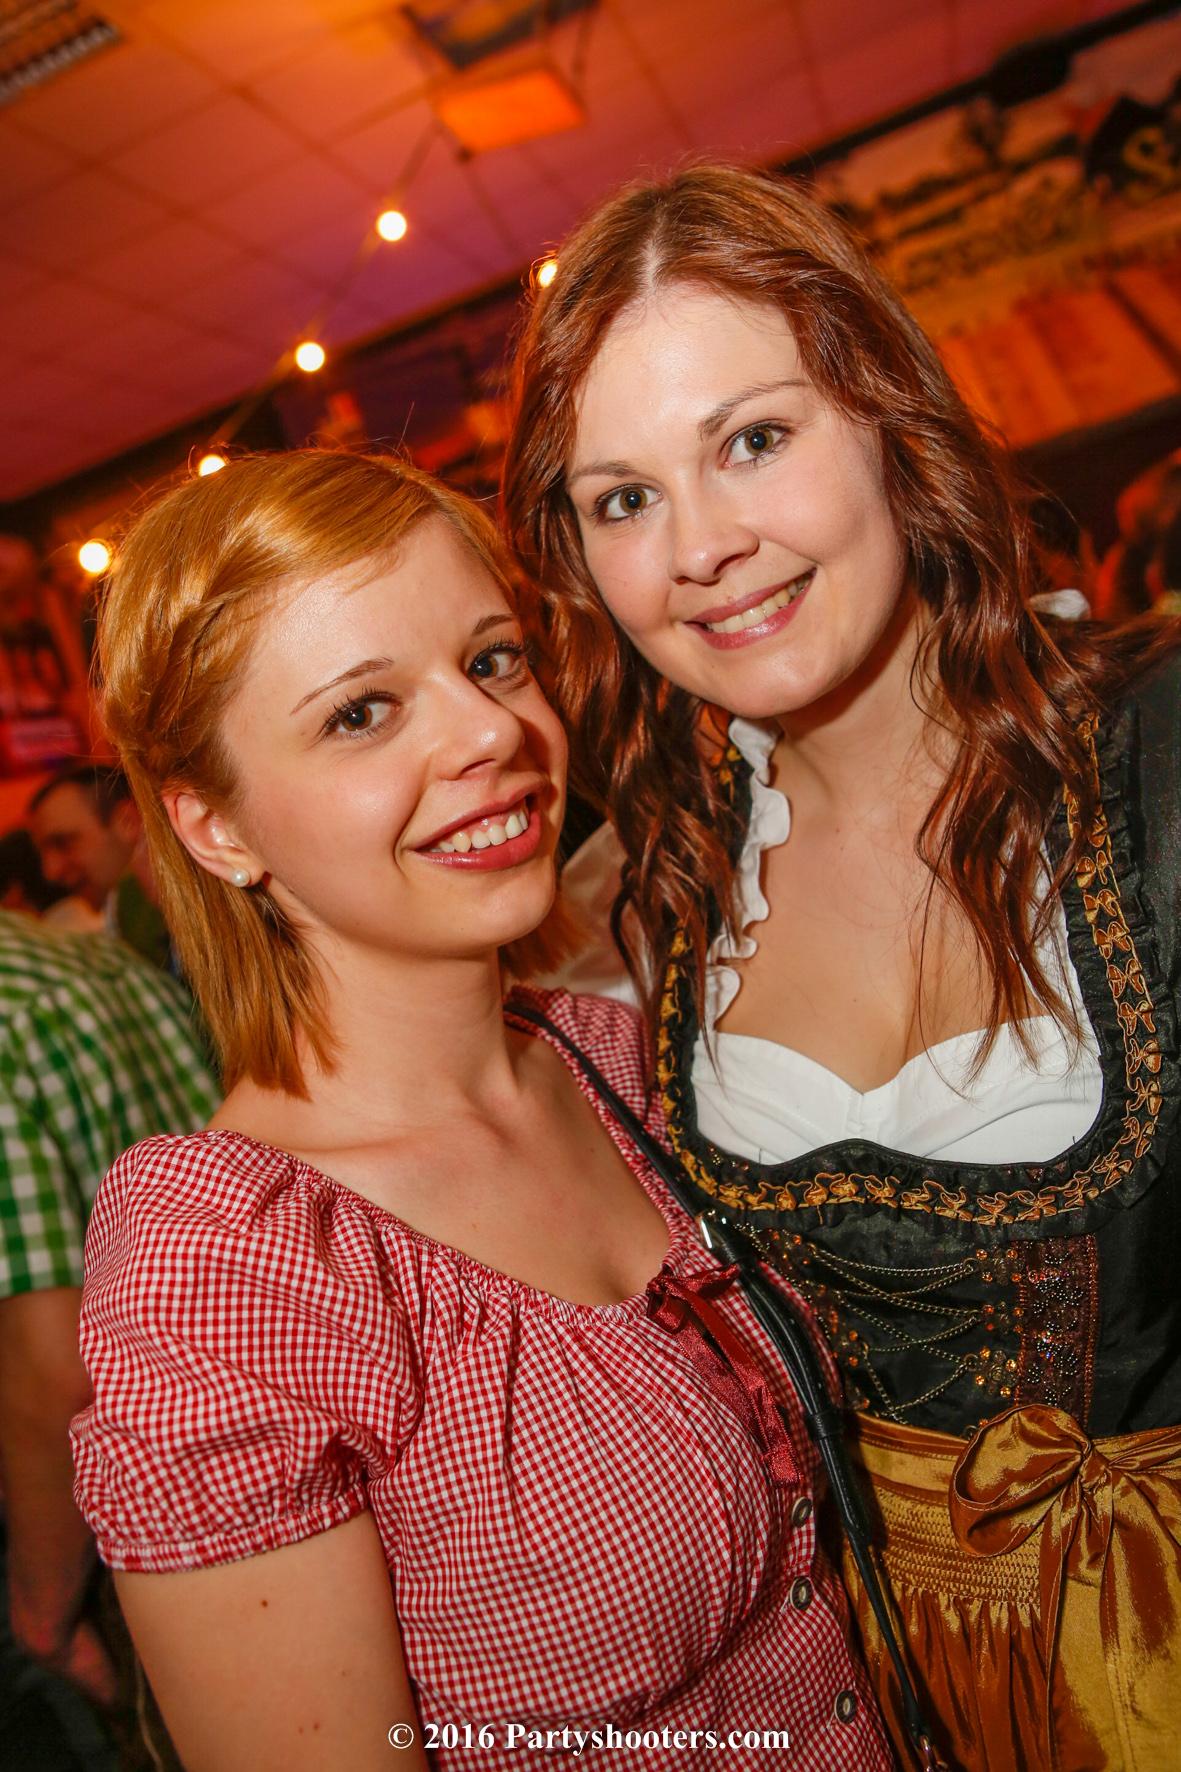 0103 - 4057 - Fruehlingsball Aspach